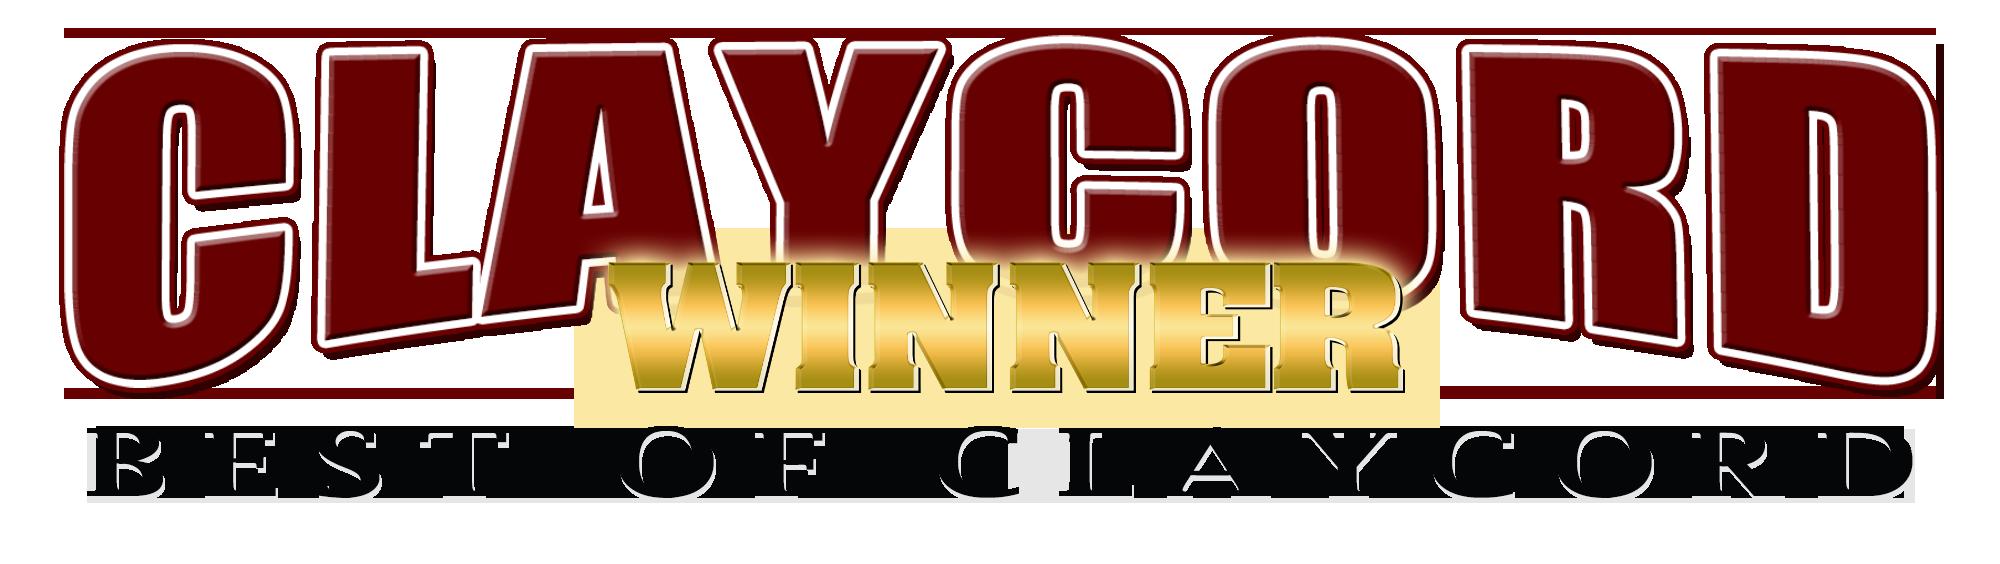 claycord_bestof_gold